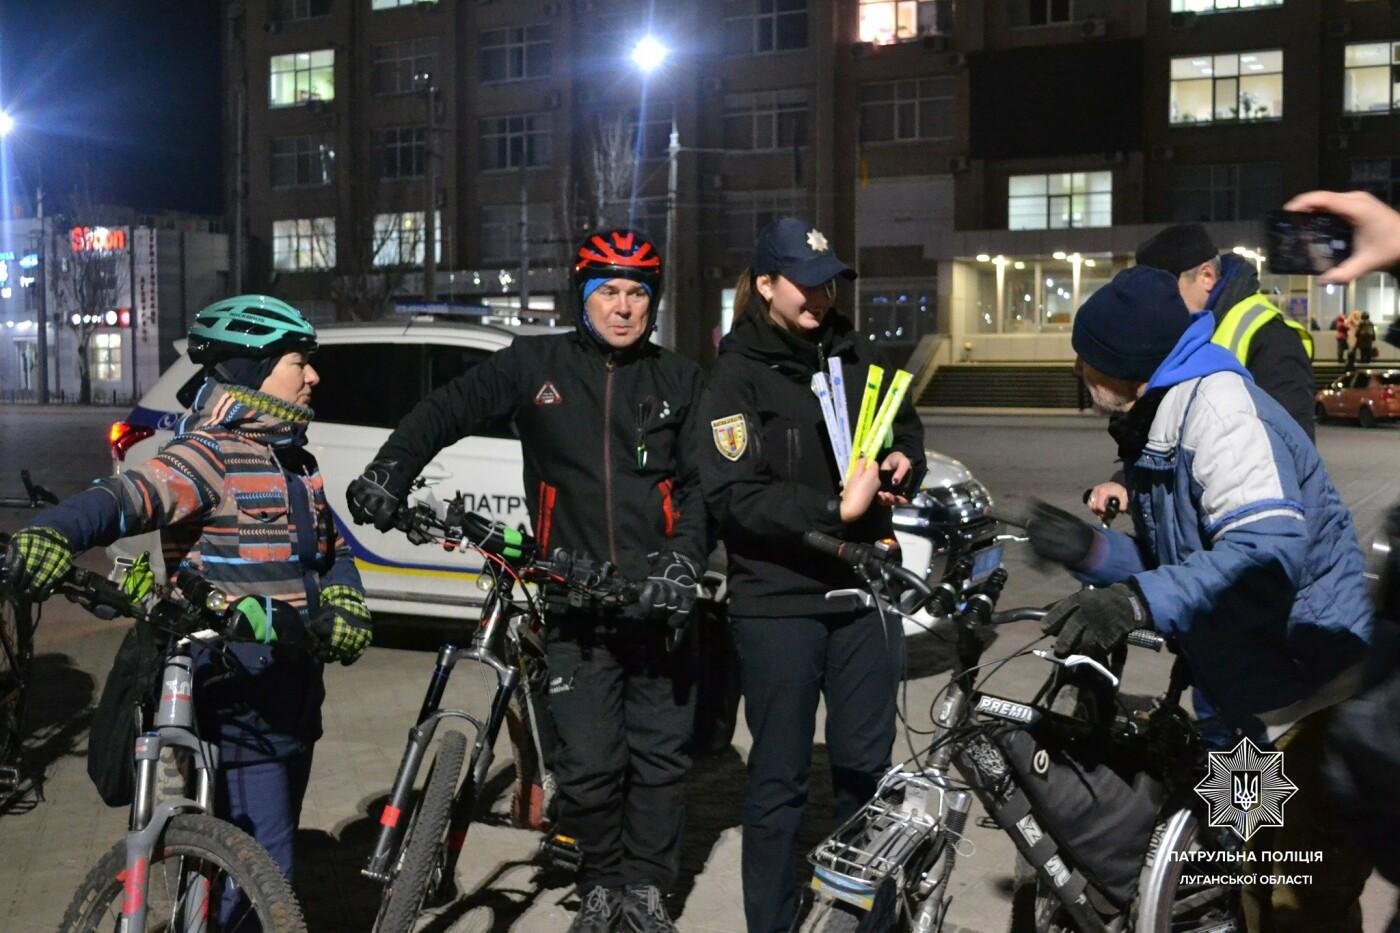 Мнение северодончан о мероприятиях полиции, фото-1